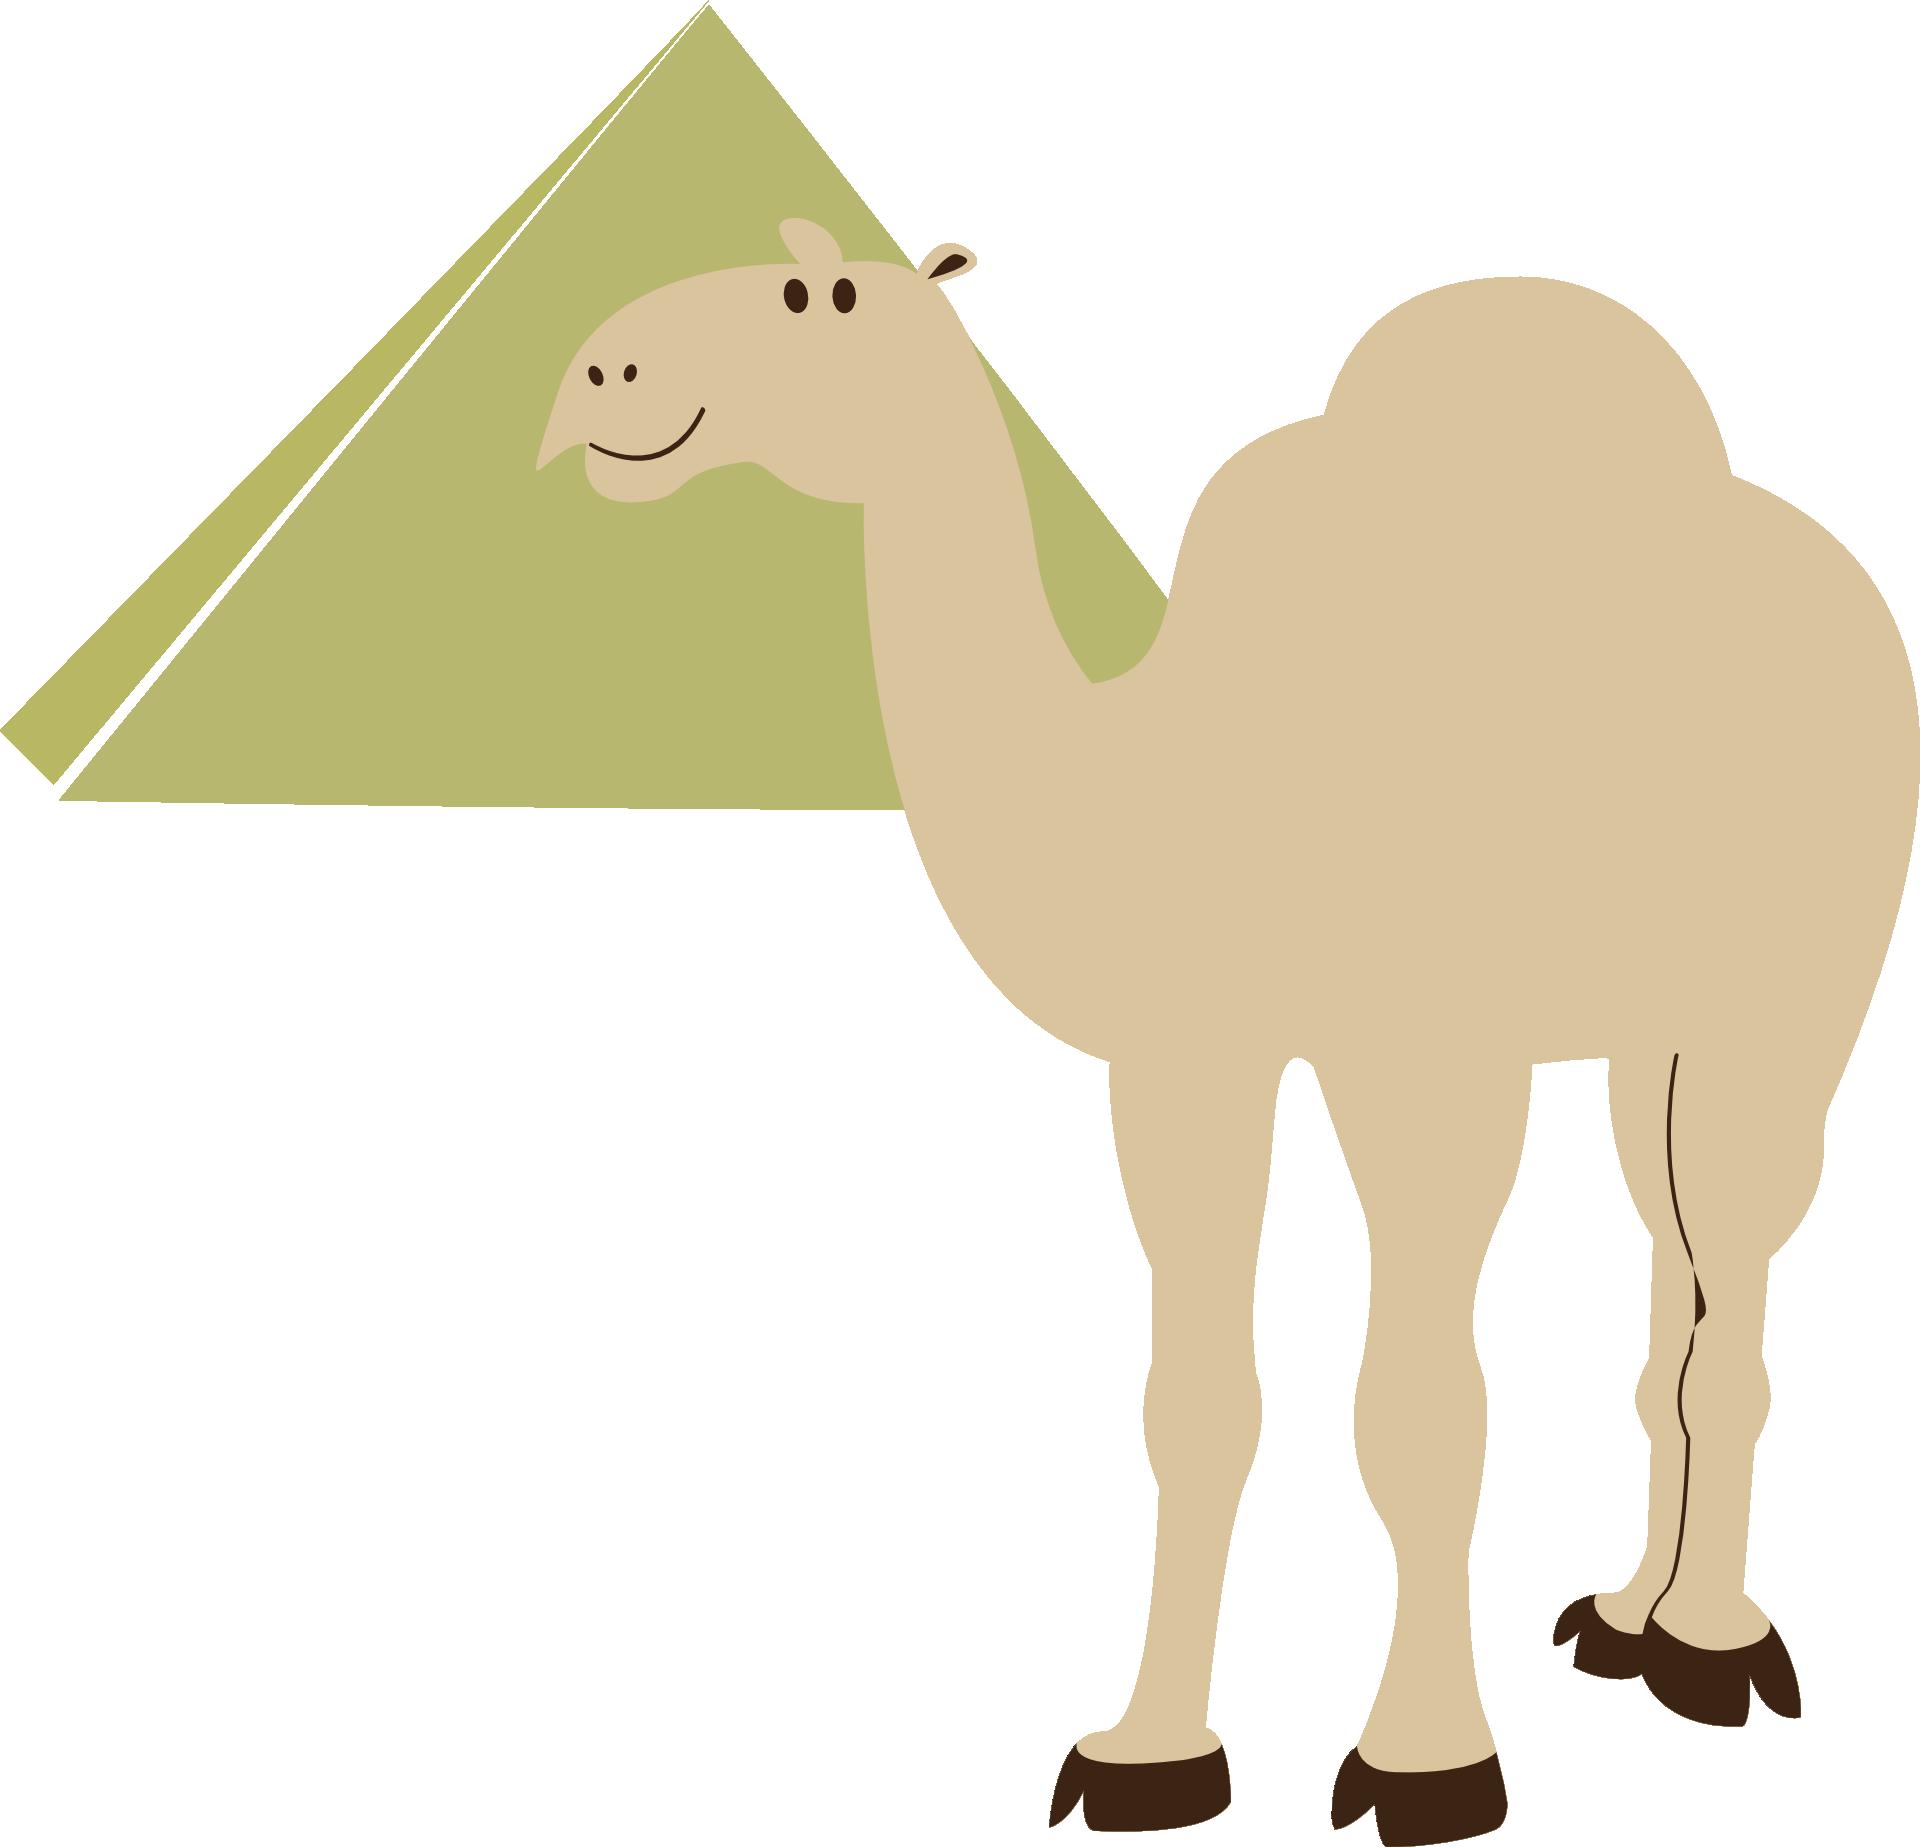 Egyptian pyramids cairo camel. Egypt clipart desert pyramid